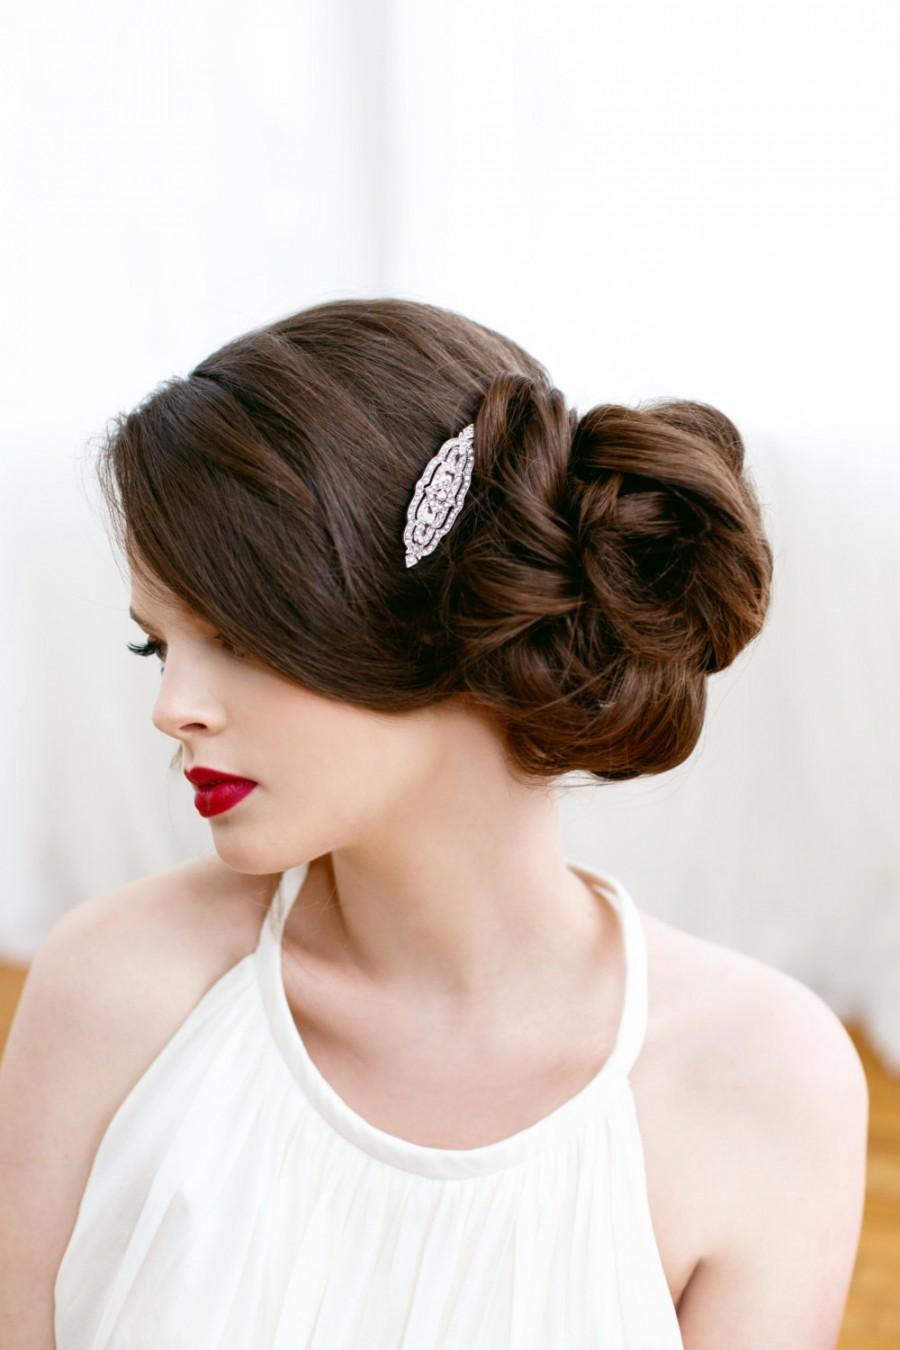 Mariage - Art Deco Clear Pave Rhinestone Silver Bridal Hair Clip, Great Gatsby, Art Deco, Downton Abbey, Bridal Accessory, Rhinestone Clip CHARLOTTE